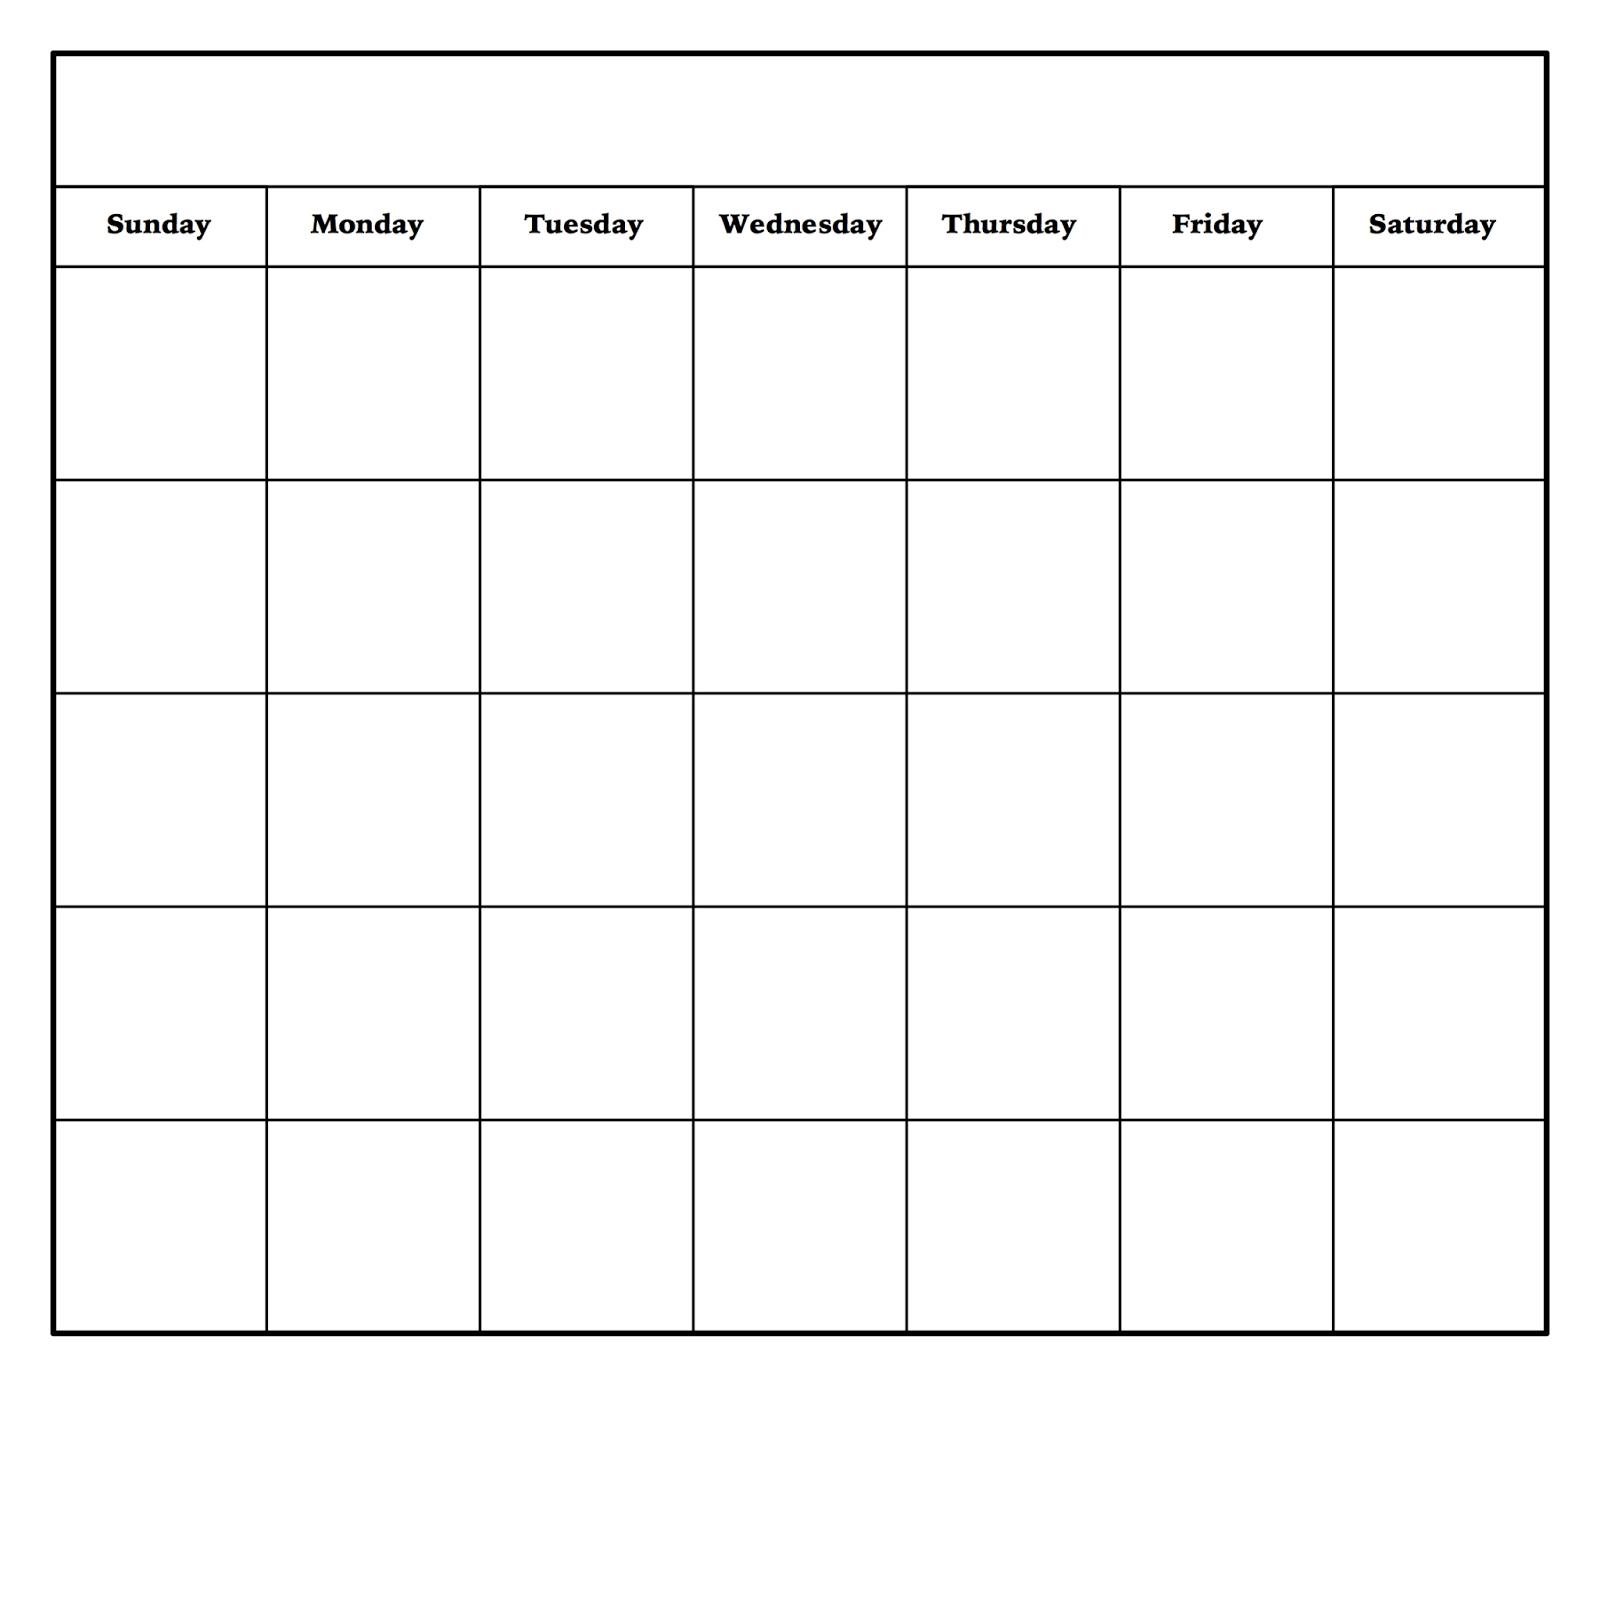 Diy Dry Erase Calendar | Blank Monthly Calendar Template-Blank Calendar No Dates